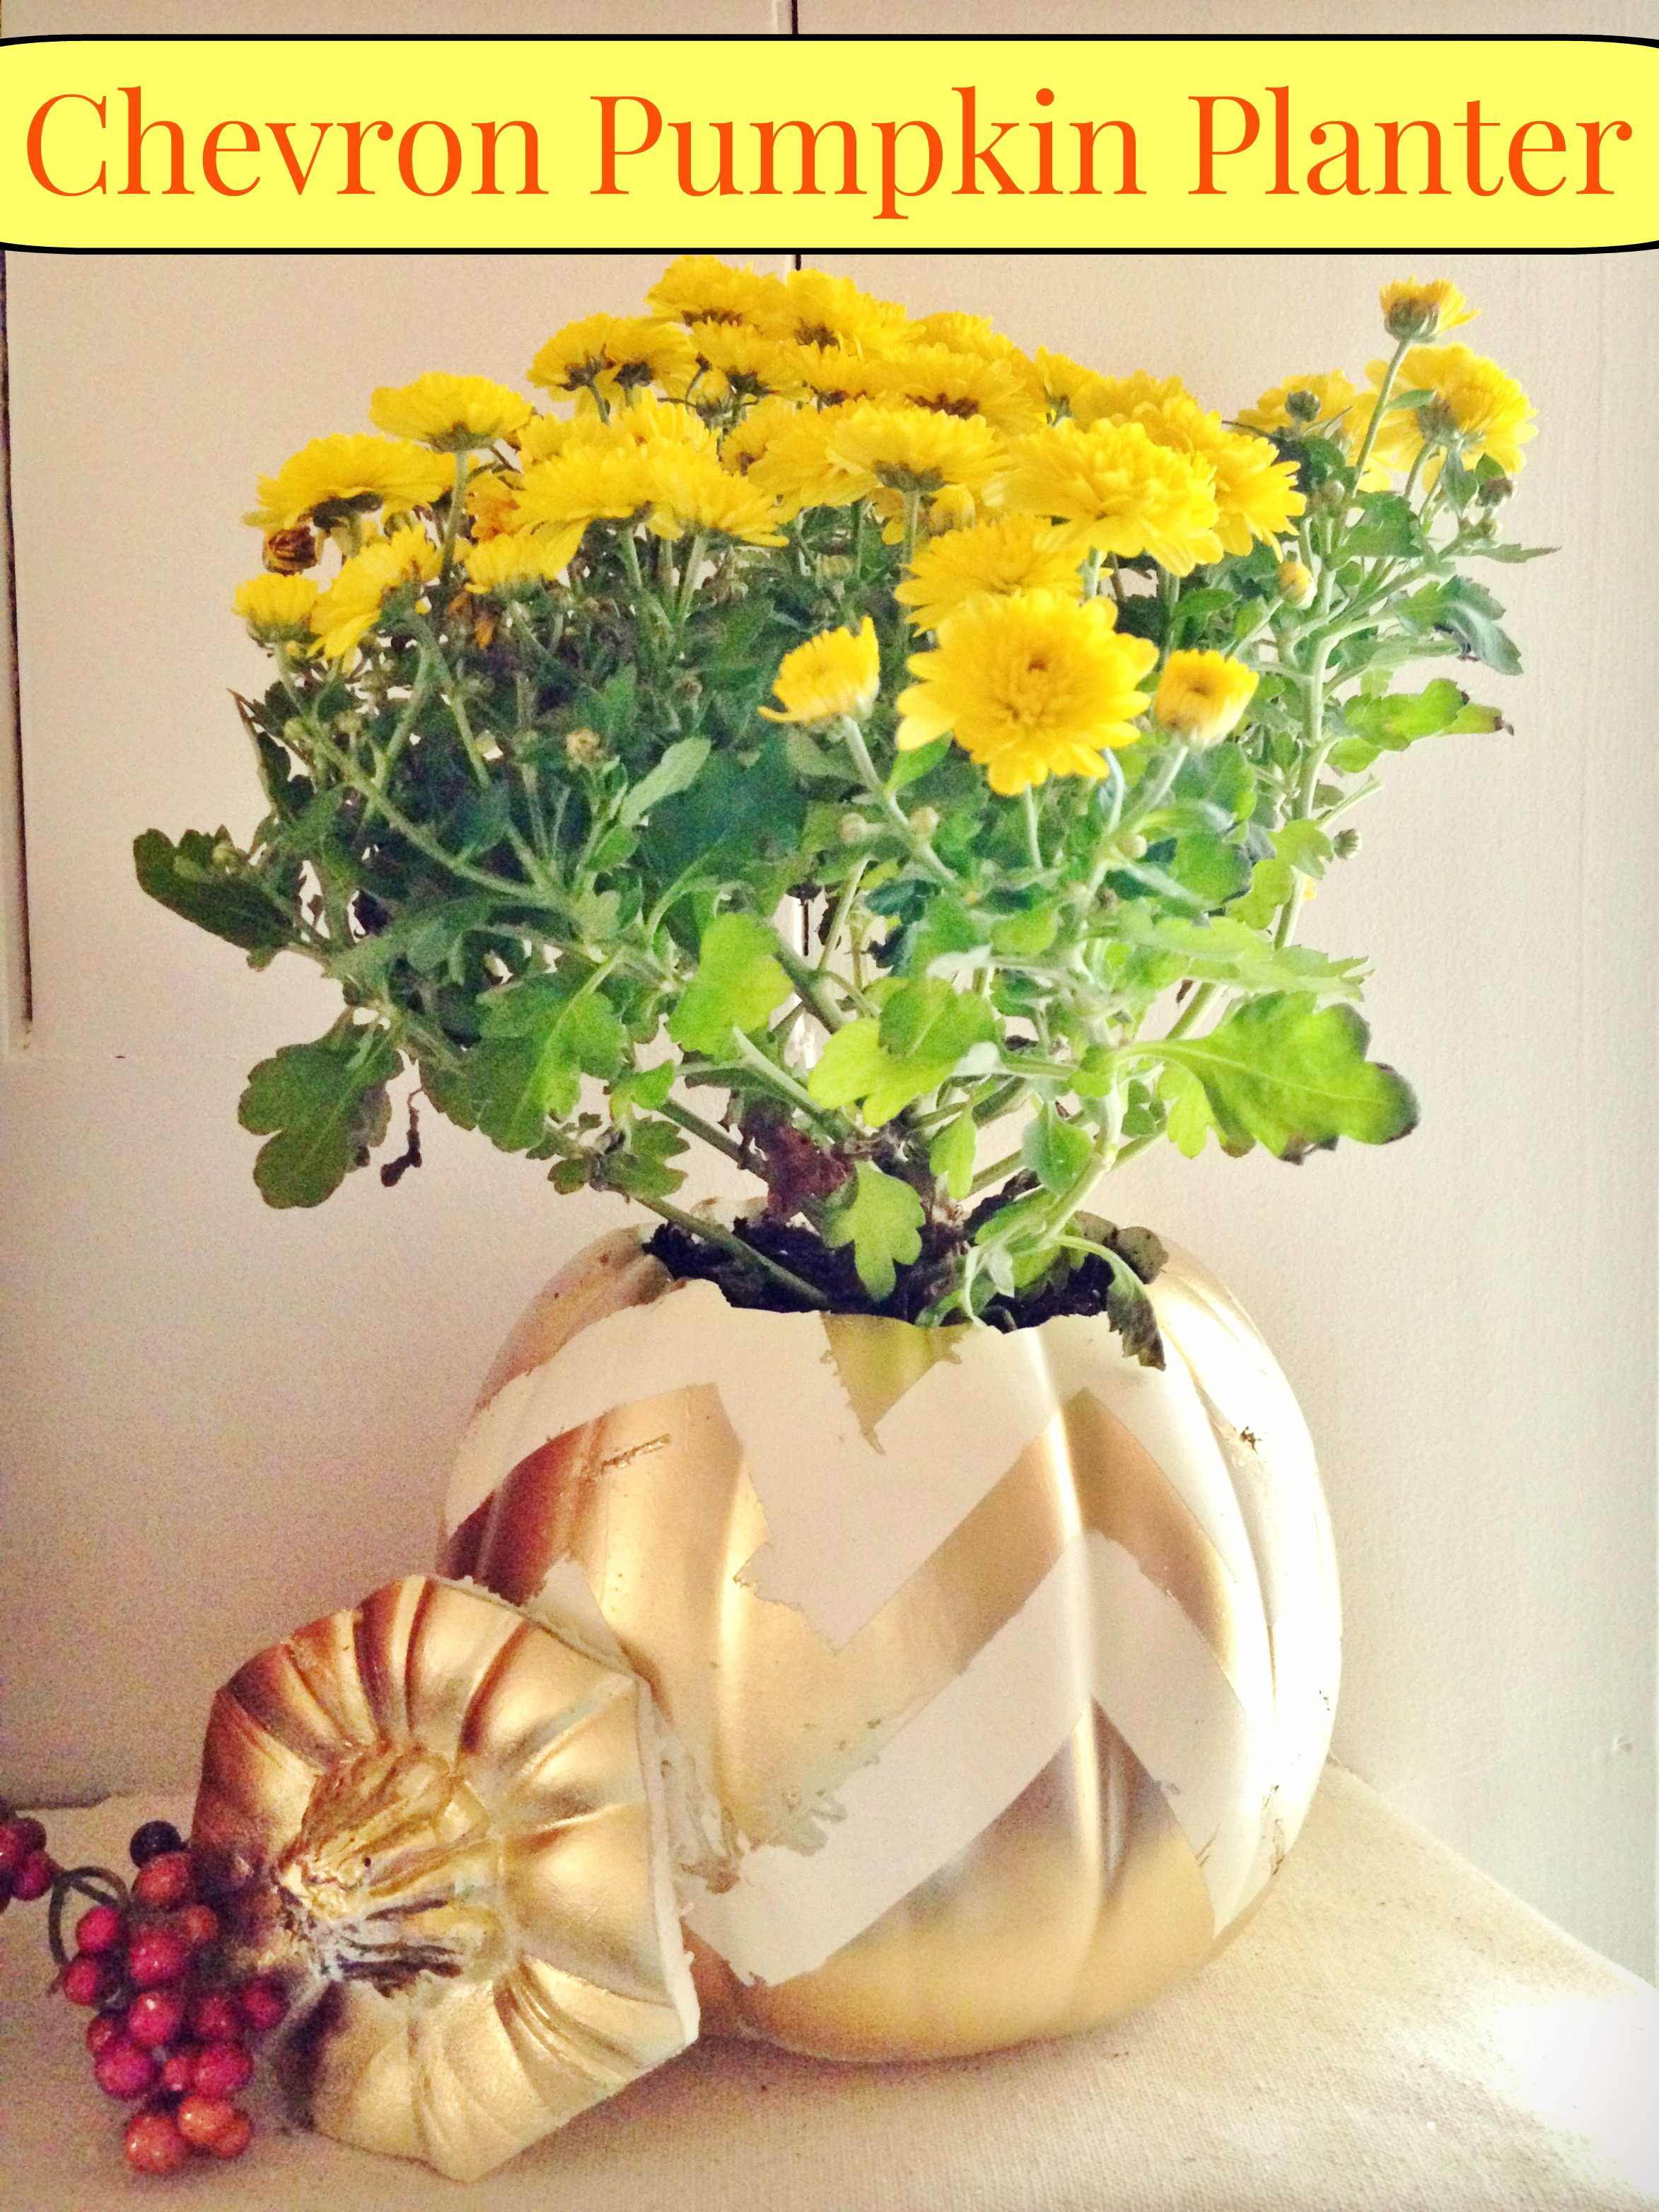 DIY Chevron Pumpkin Planter Frugal Fall Home Decor Craft